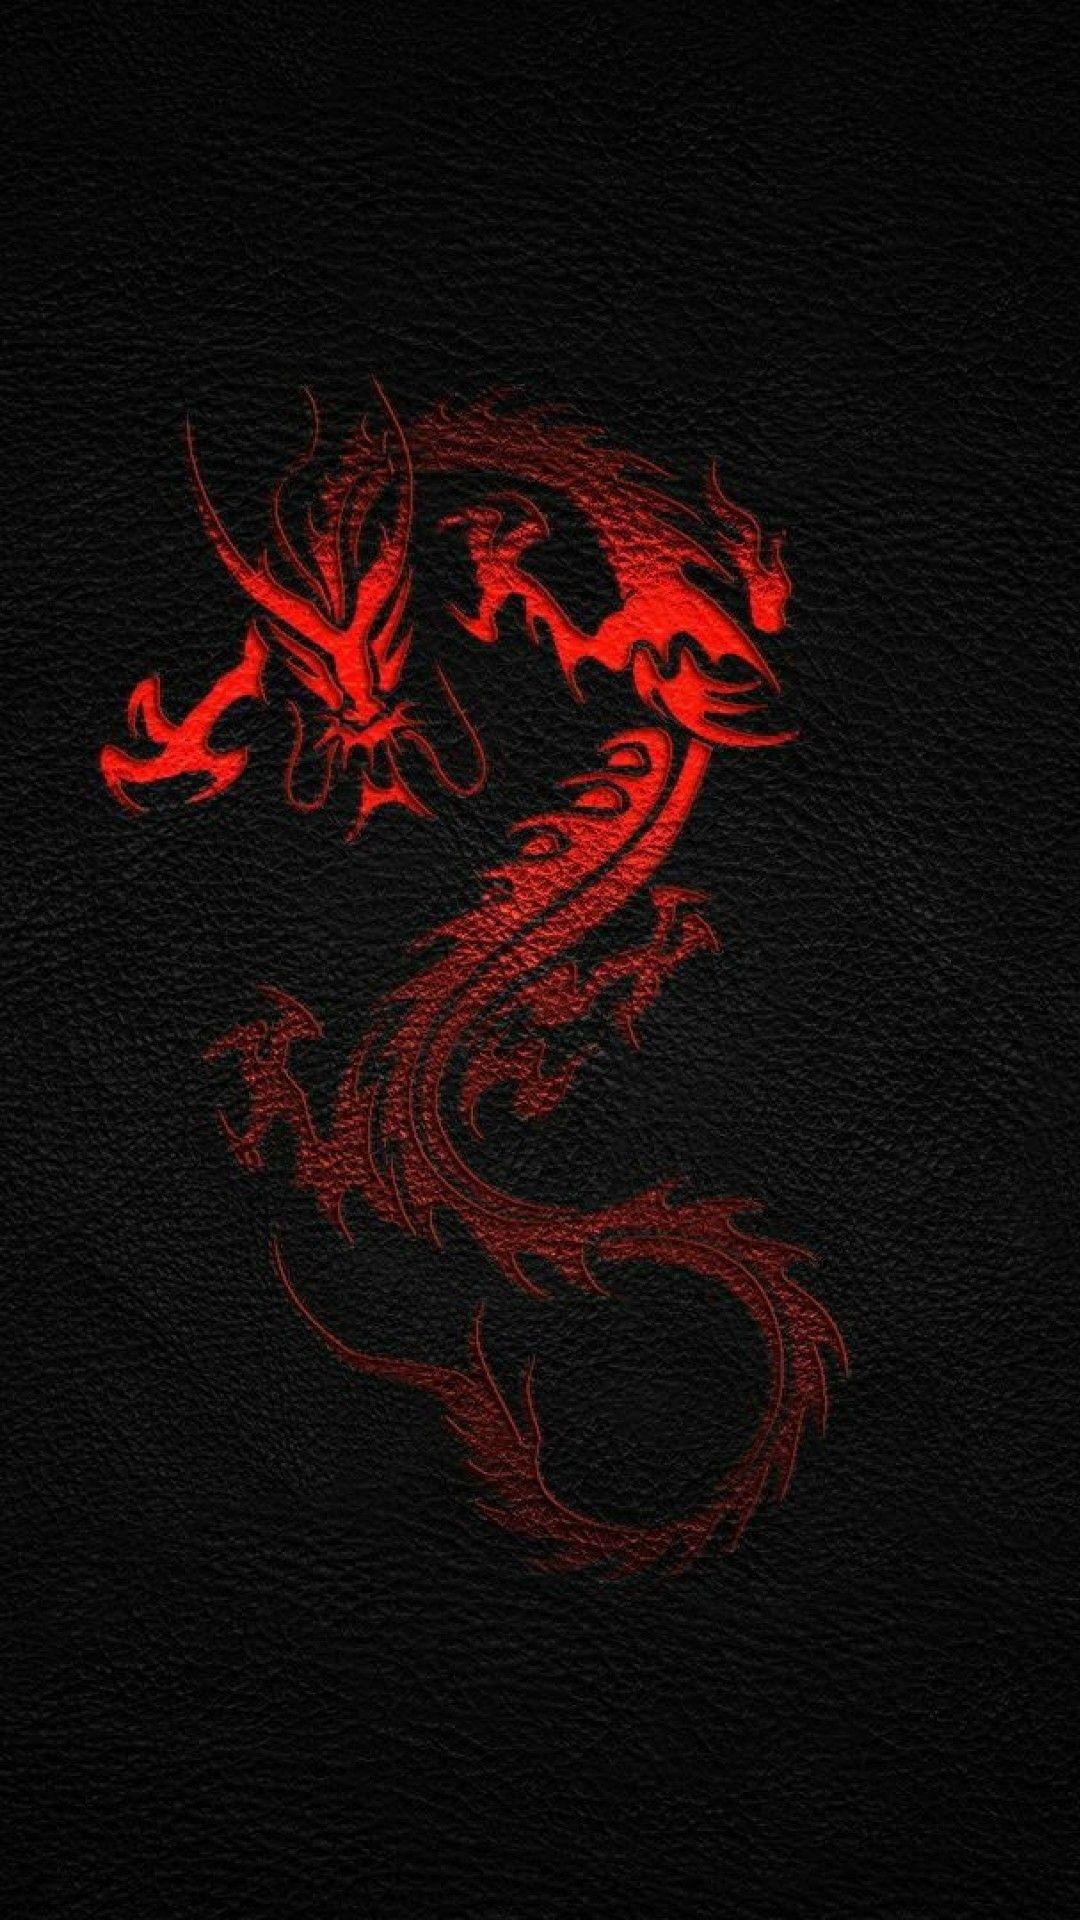 Chinese Dragon Wallpaper Iphone : chinese, dragon, wallpaper, iphone, Black, Chinese, Dragon, Iphone, Wallpaper